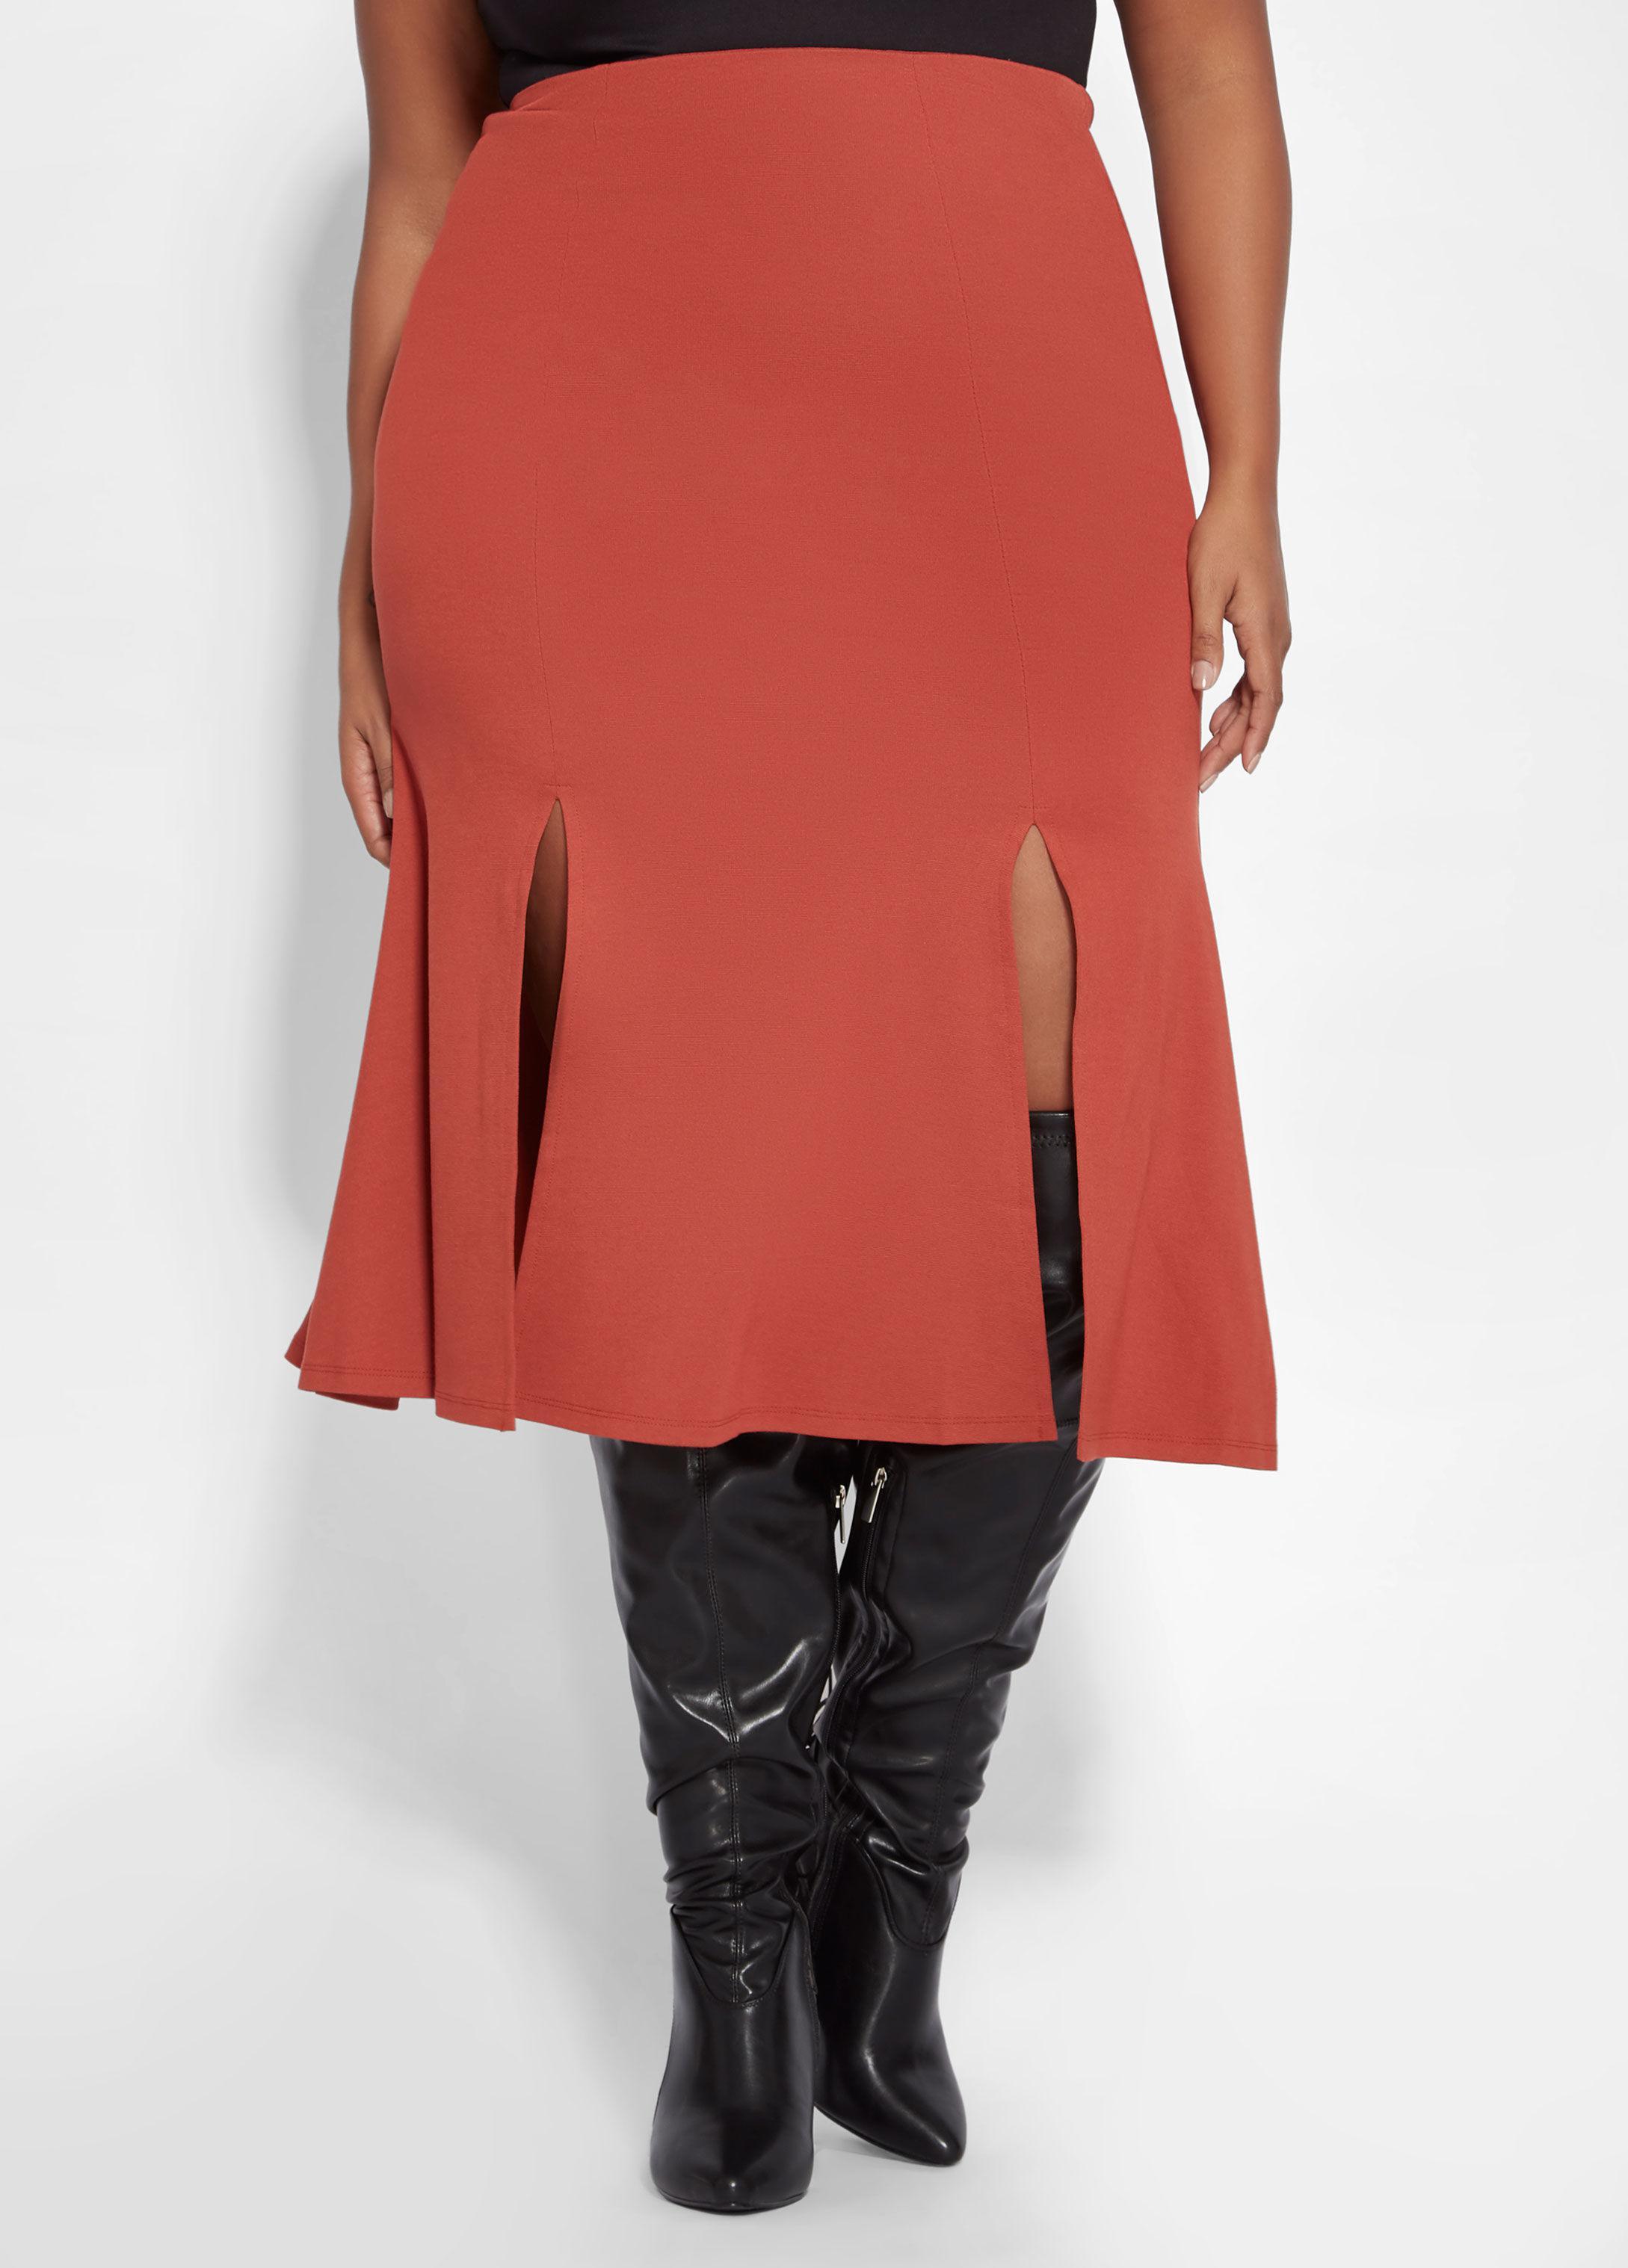 8ef81eeb984e0 Ashley Stewart. Women s Plus Size Ponte Knit Flare Skirt